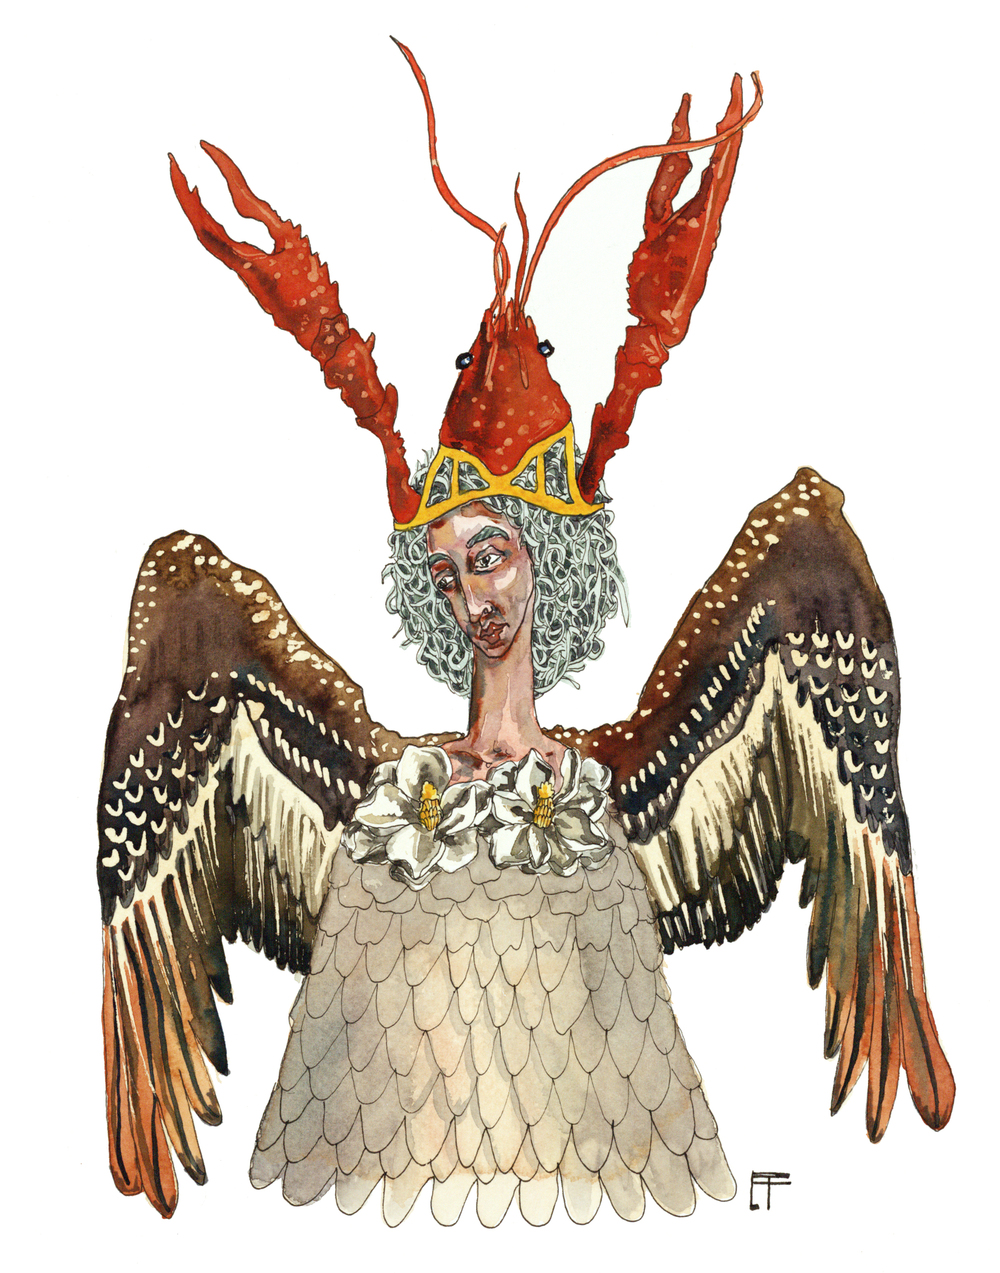 Louisiana Deity: Pelican